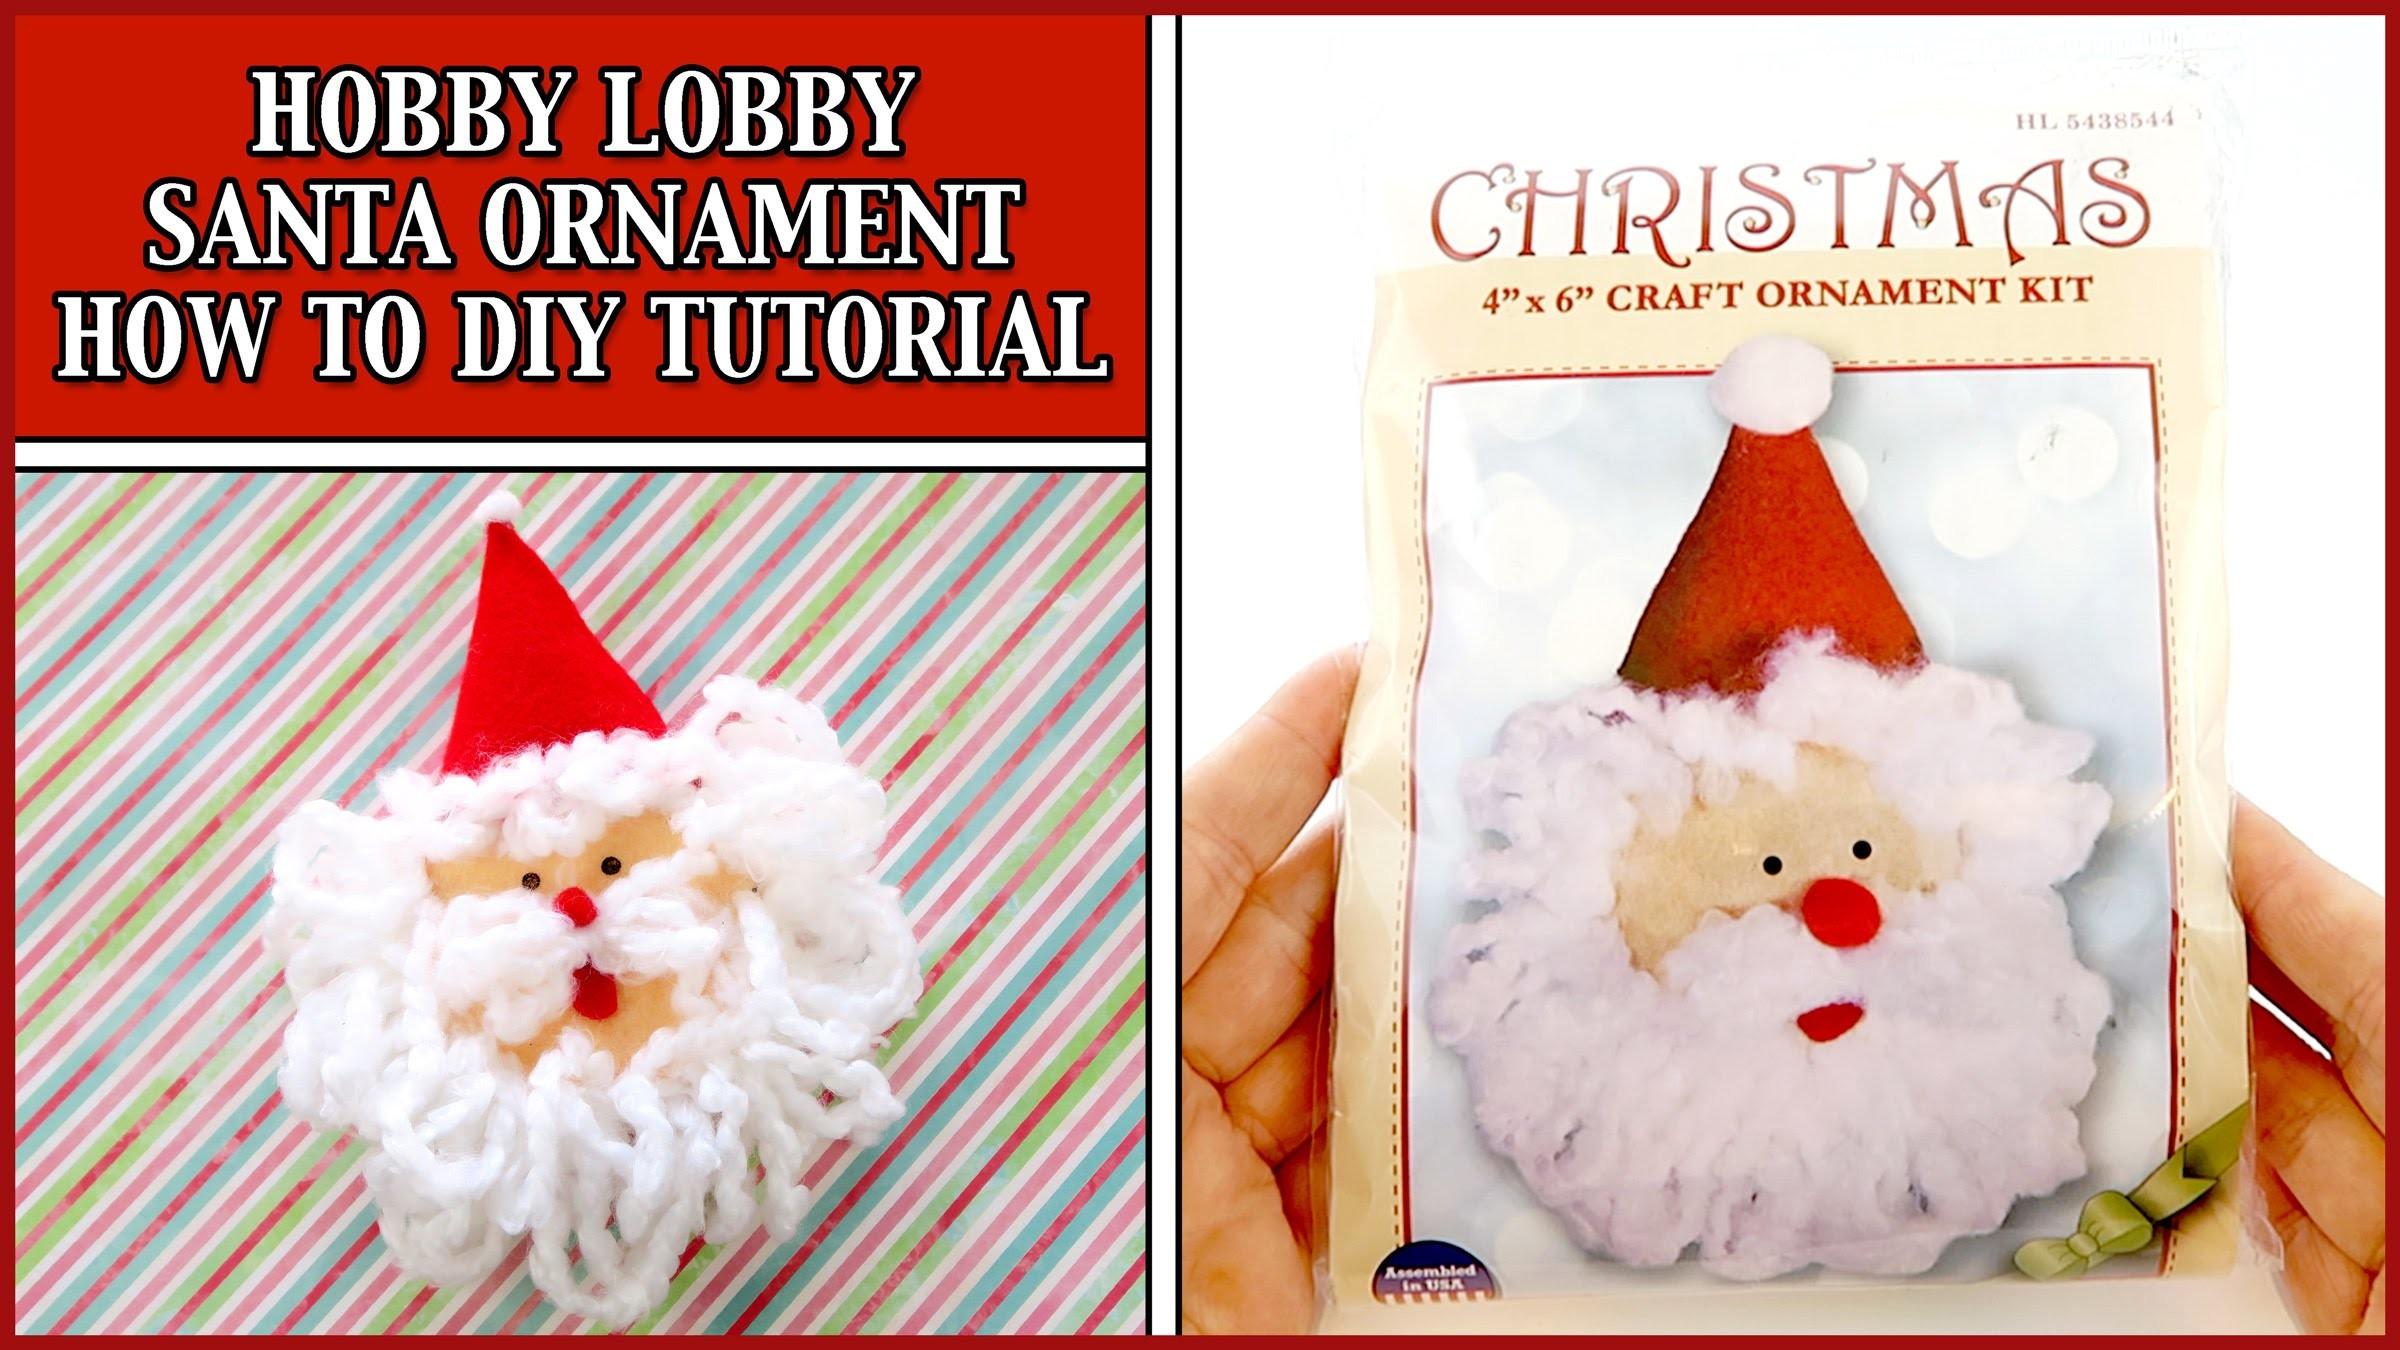 HOBBY LOBBY - SANTA ORNAMENT CRAFT KIT - HOW TO DIY TUTORIAL